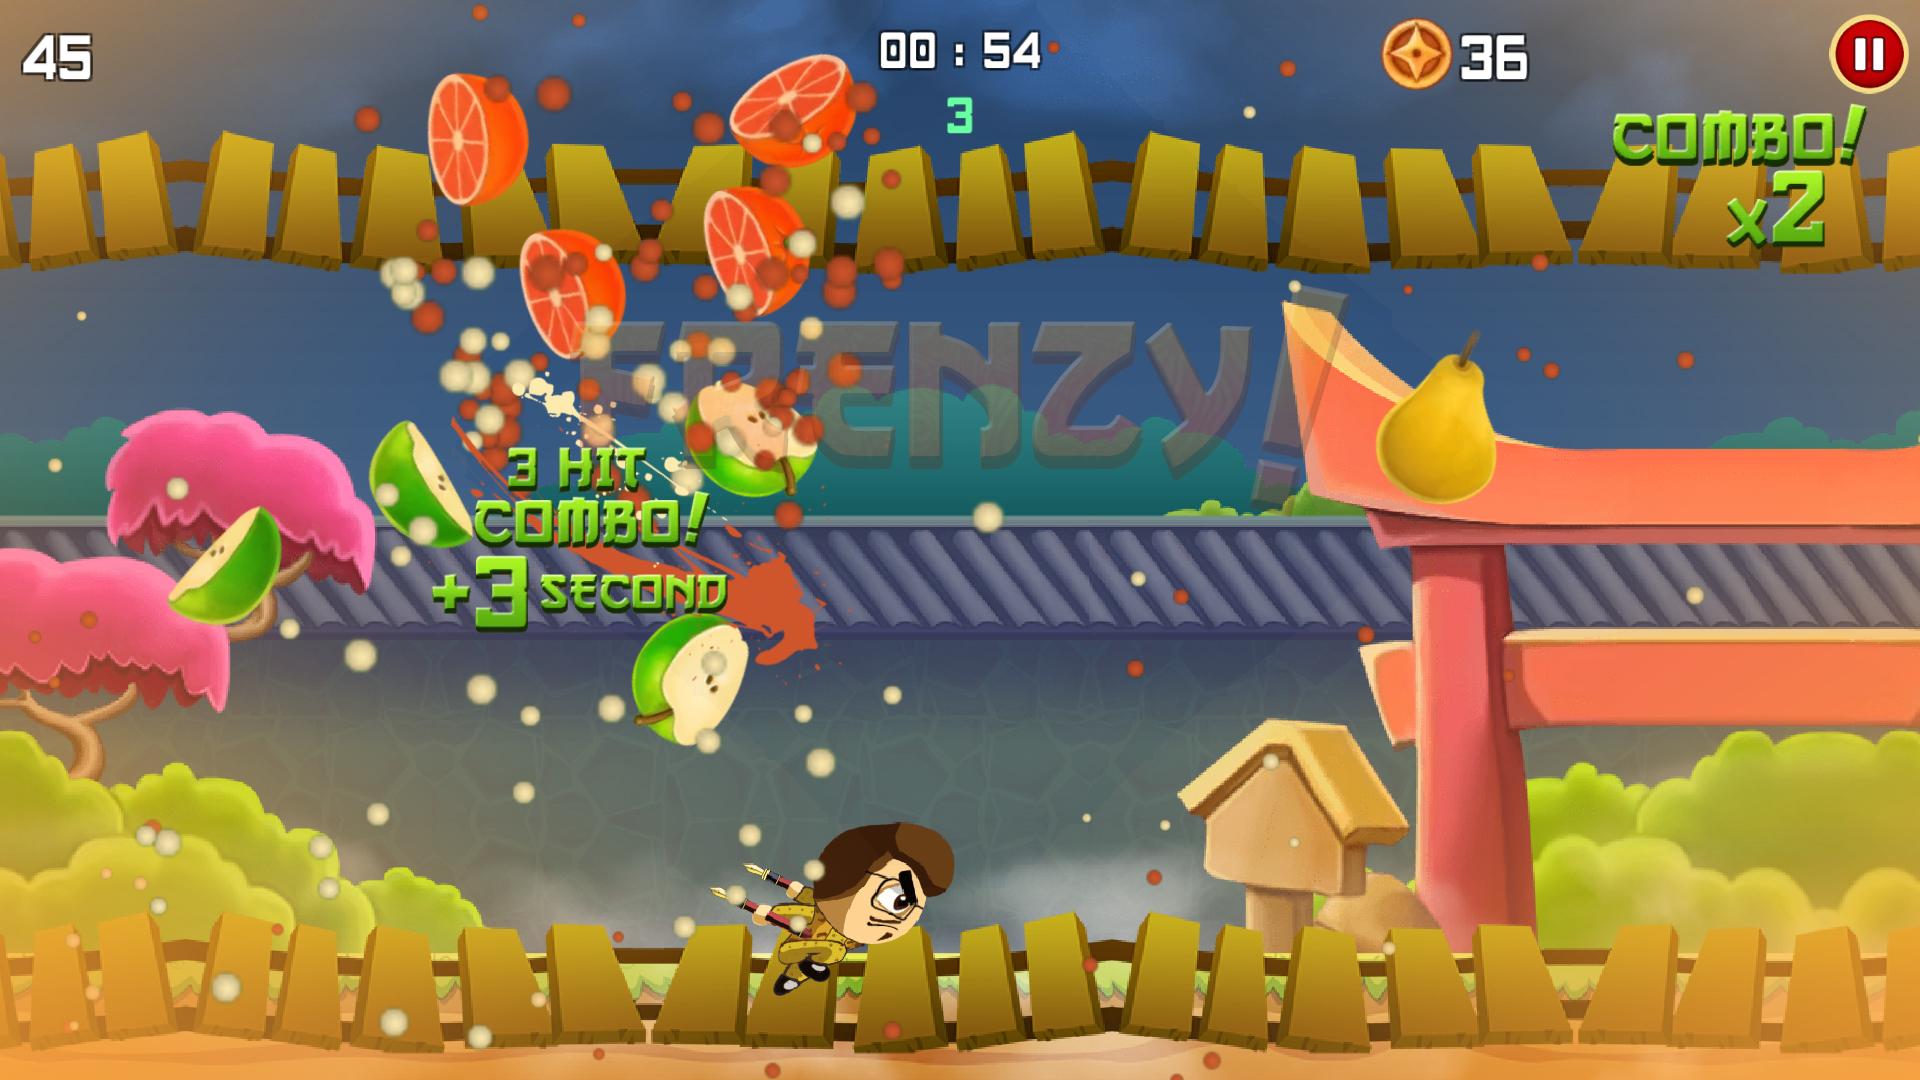 Boo Ninja Fruit: Amazon.es: Appstore para Android